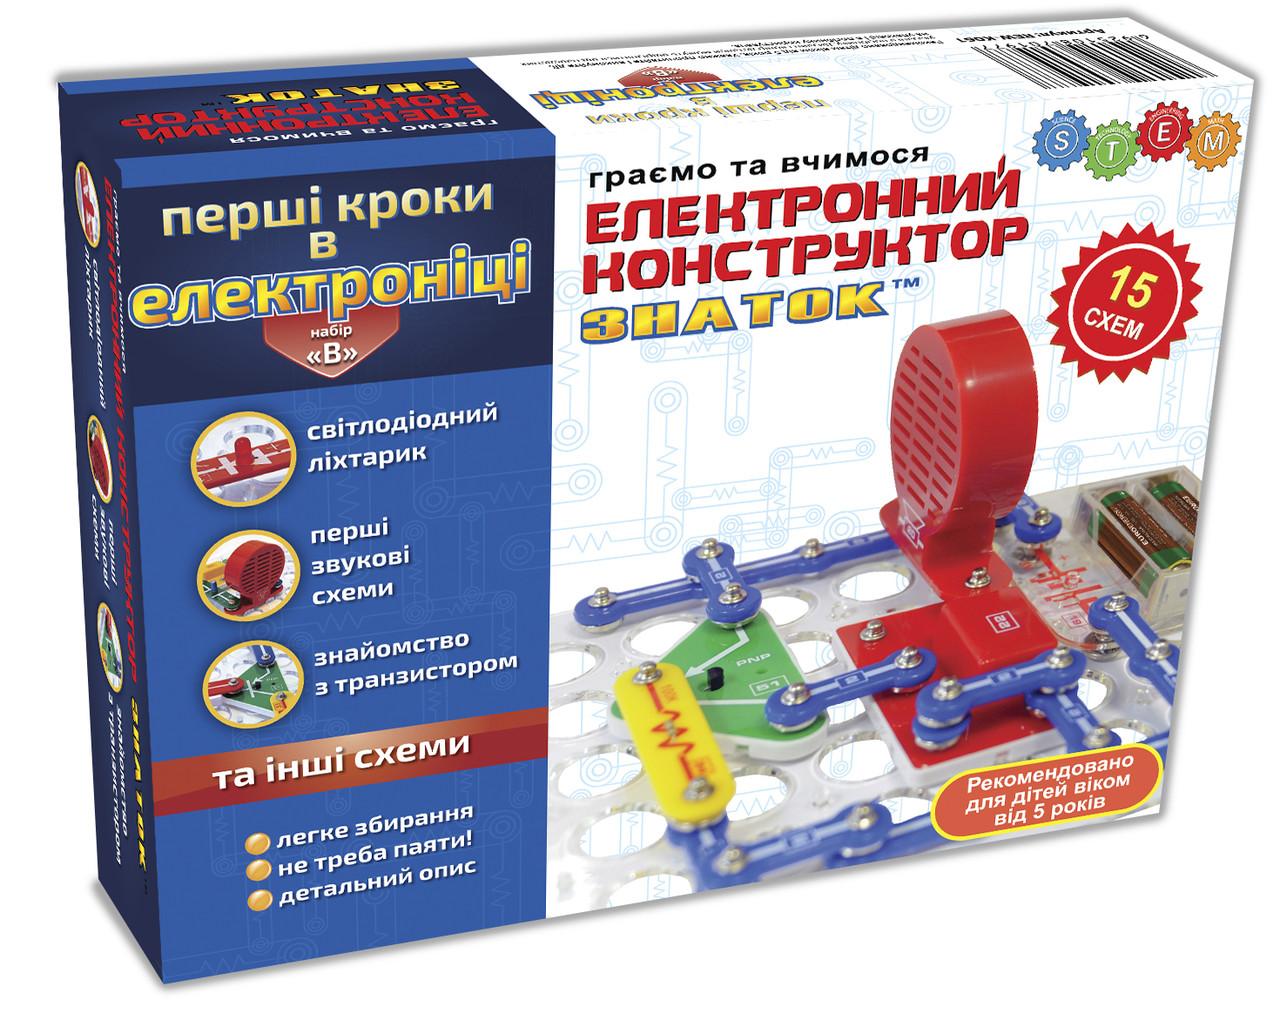 Электронный конструктор знаток грн